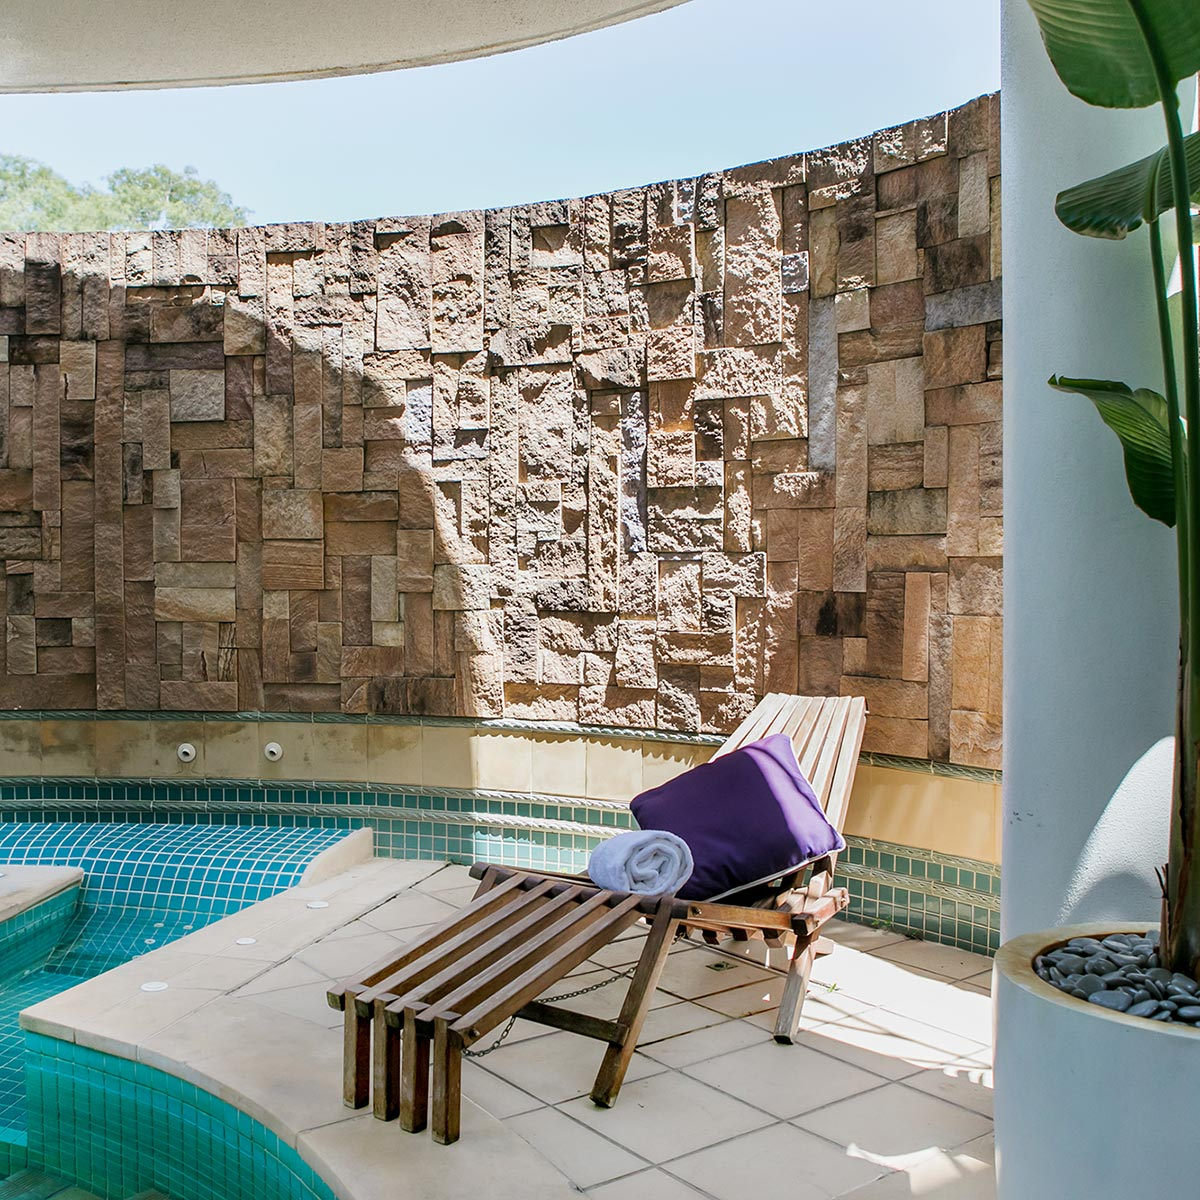 Aqua Day Spa, Noosa - Therapy Pool